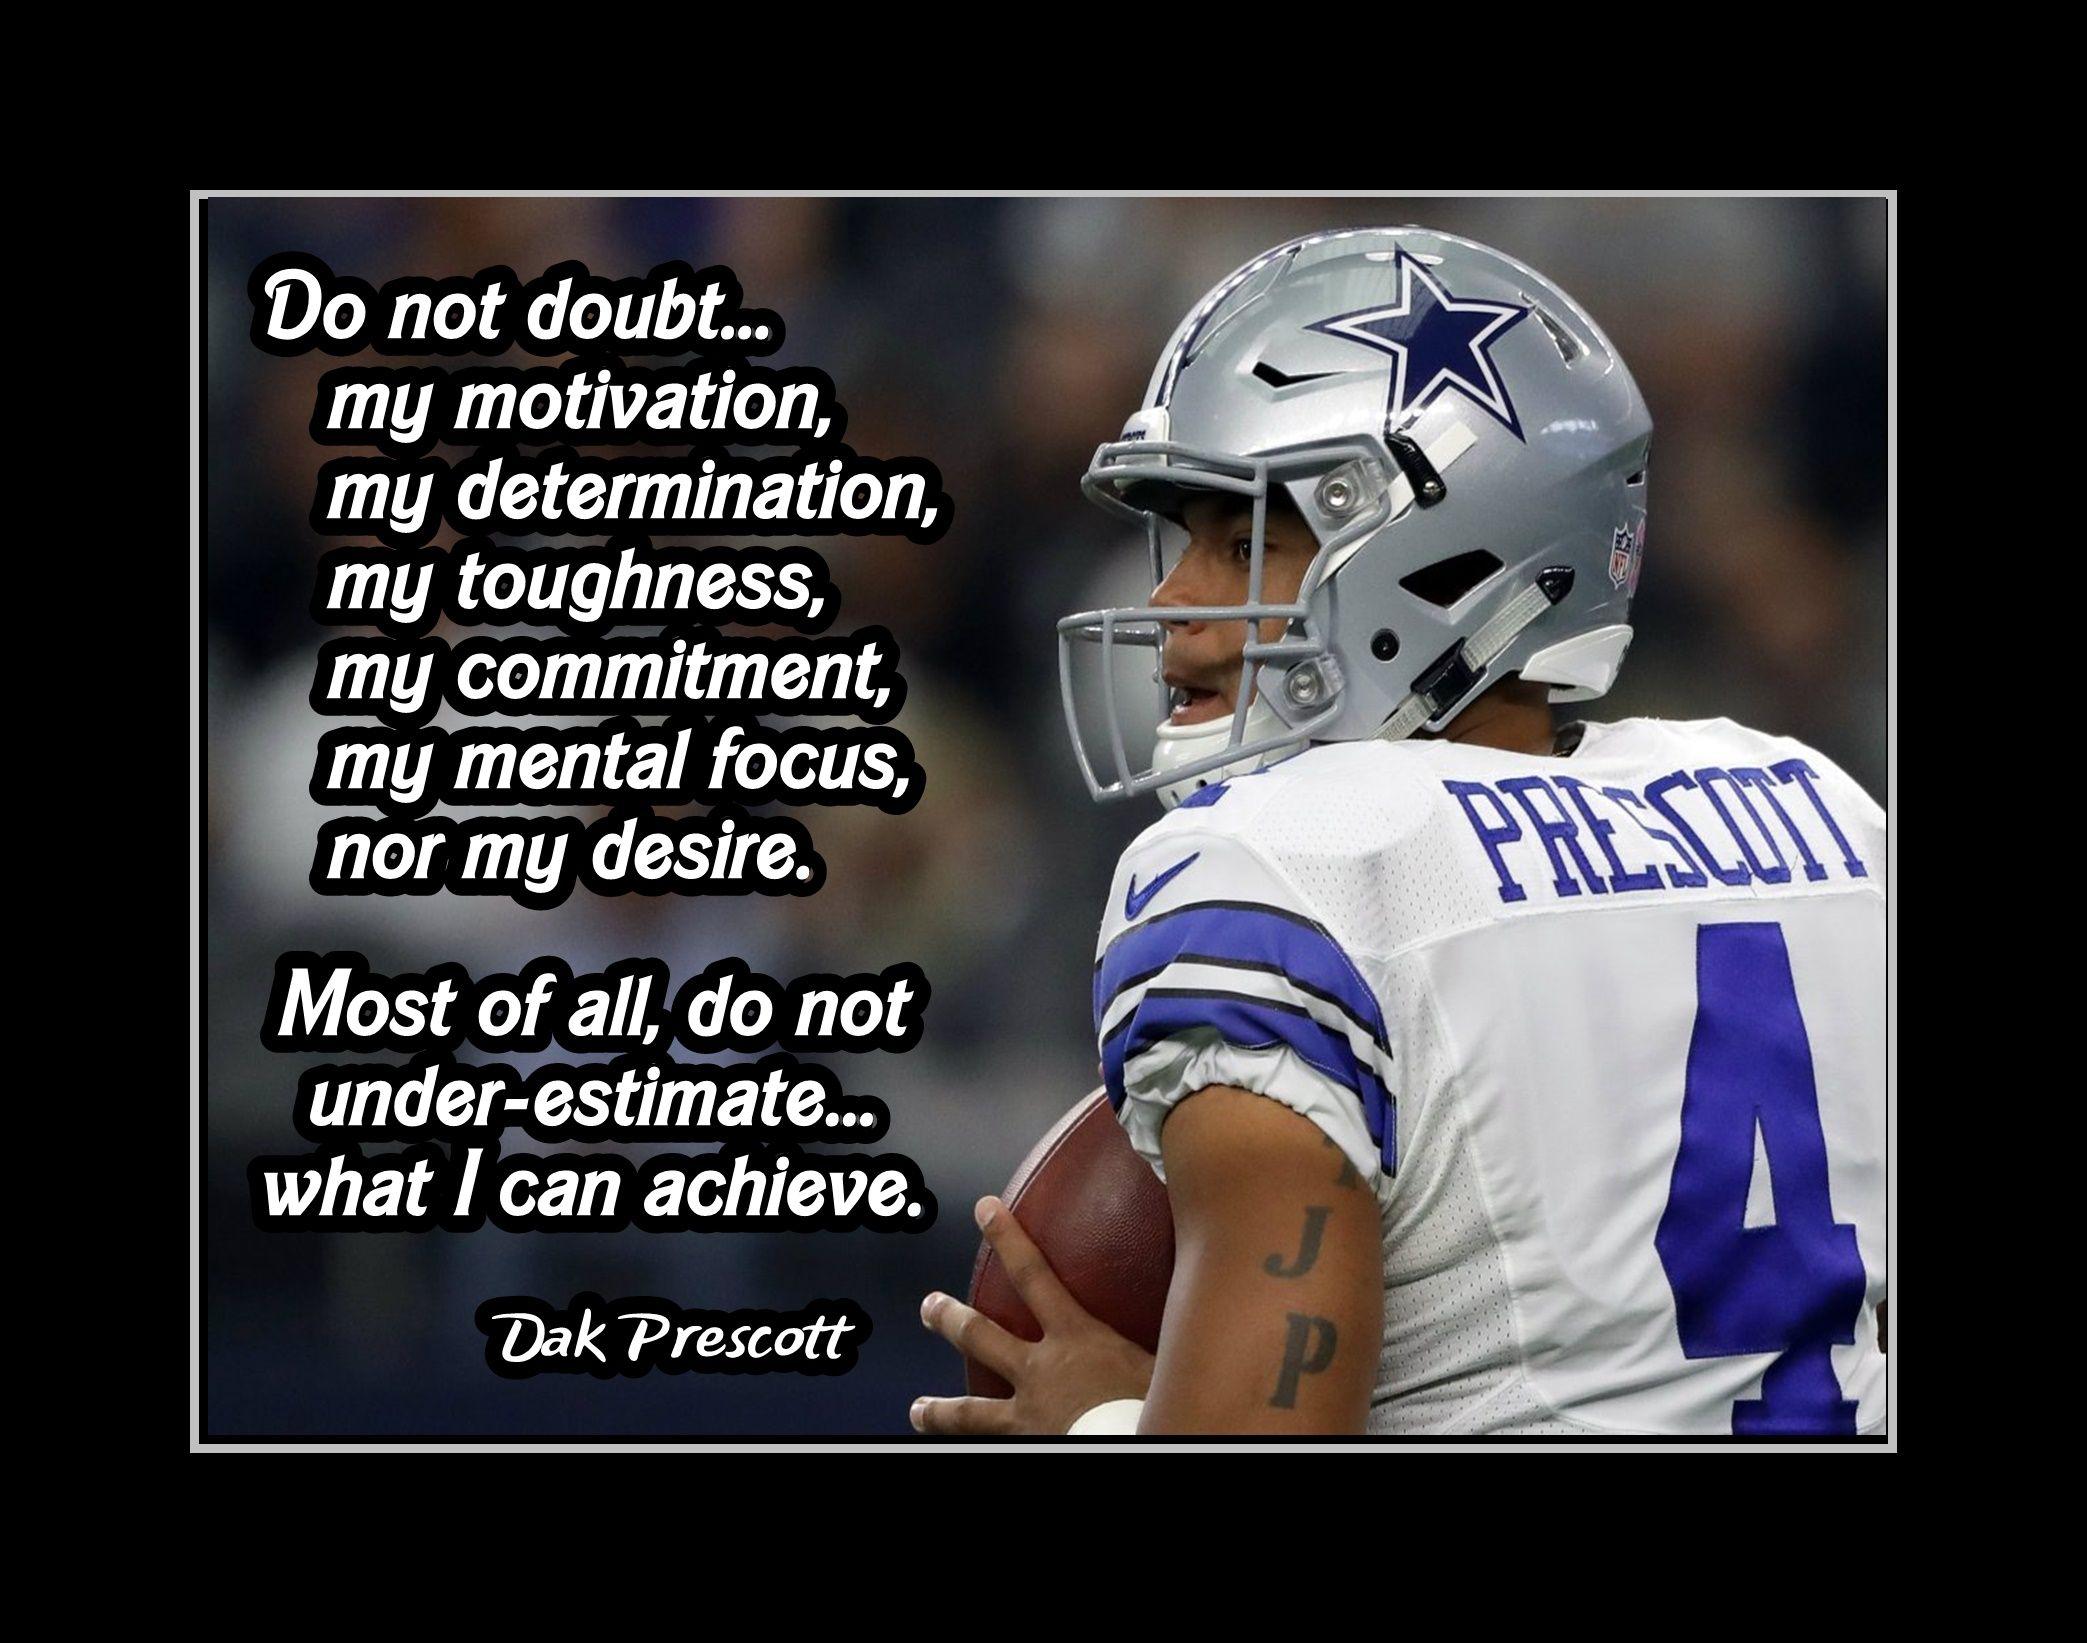 Inspirational Football Quote Poster Dak Prescott Dallas Cowboys Nfl Motivation Quote Wall Art In 2021 Football Motivation Inspirational Football Quotes Football Quotes